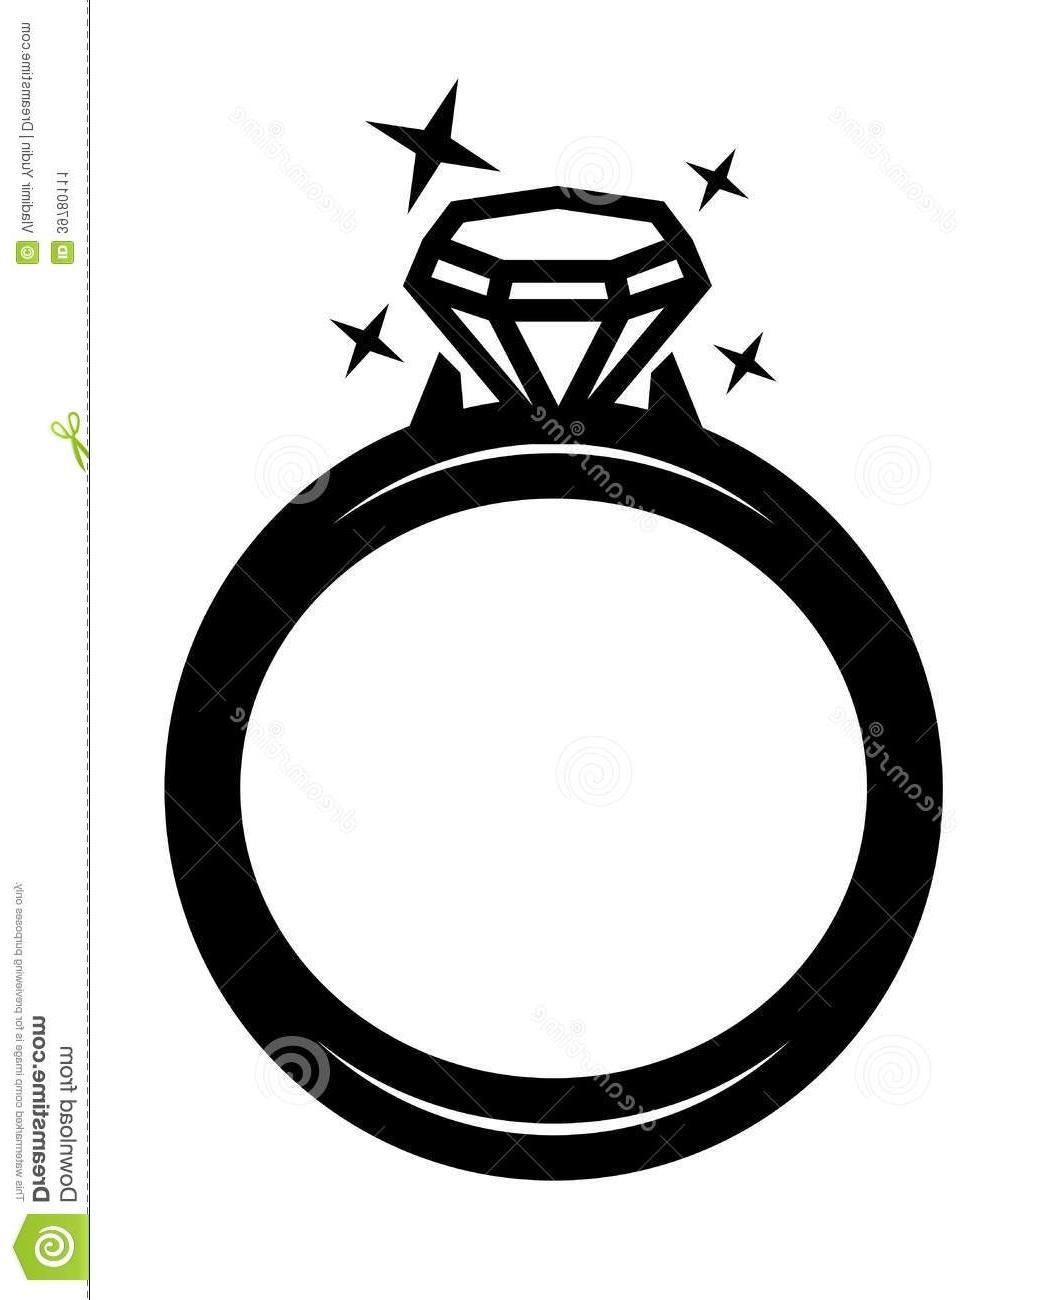 1043x1300 Wedding Ring Silhouette Clip Art